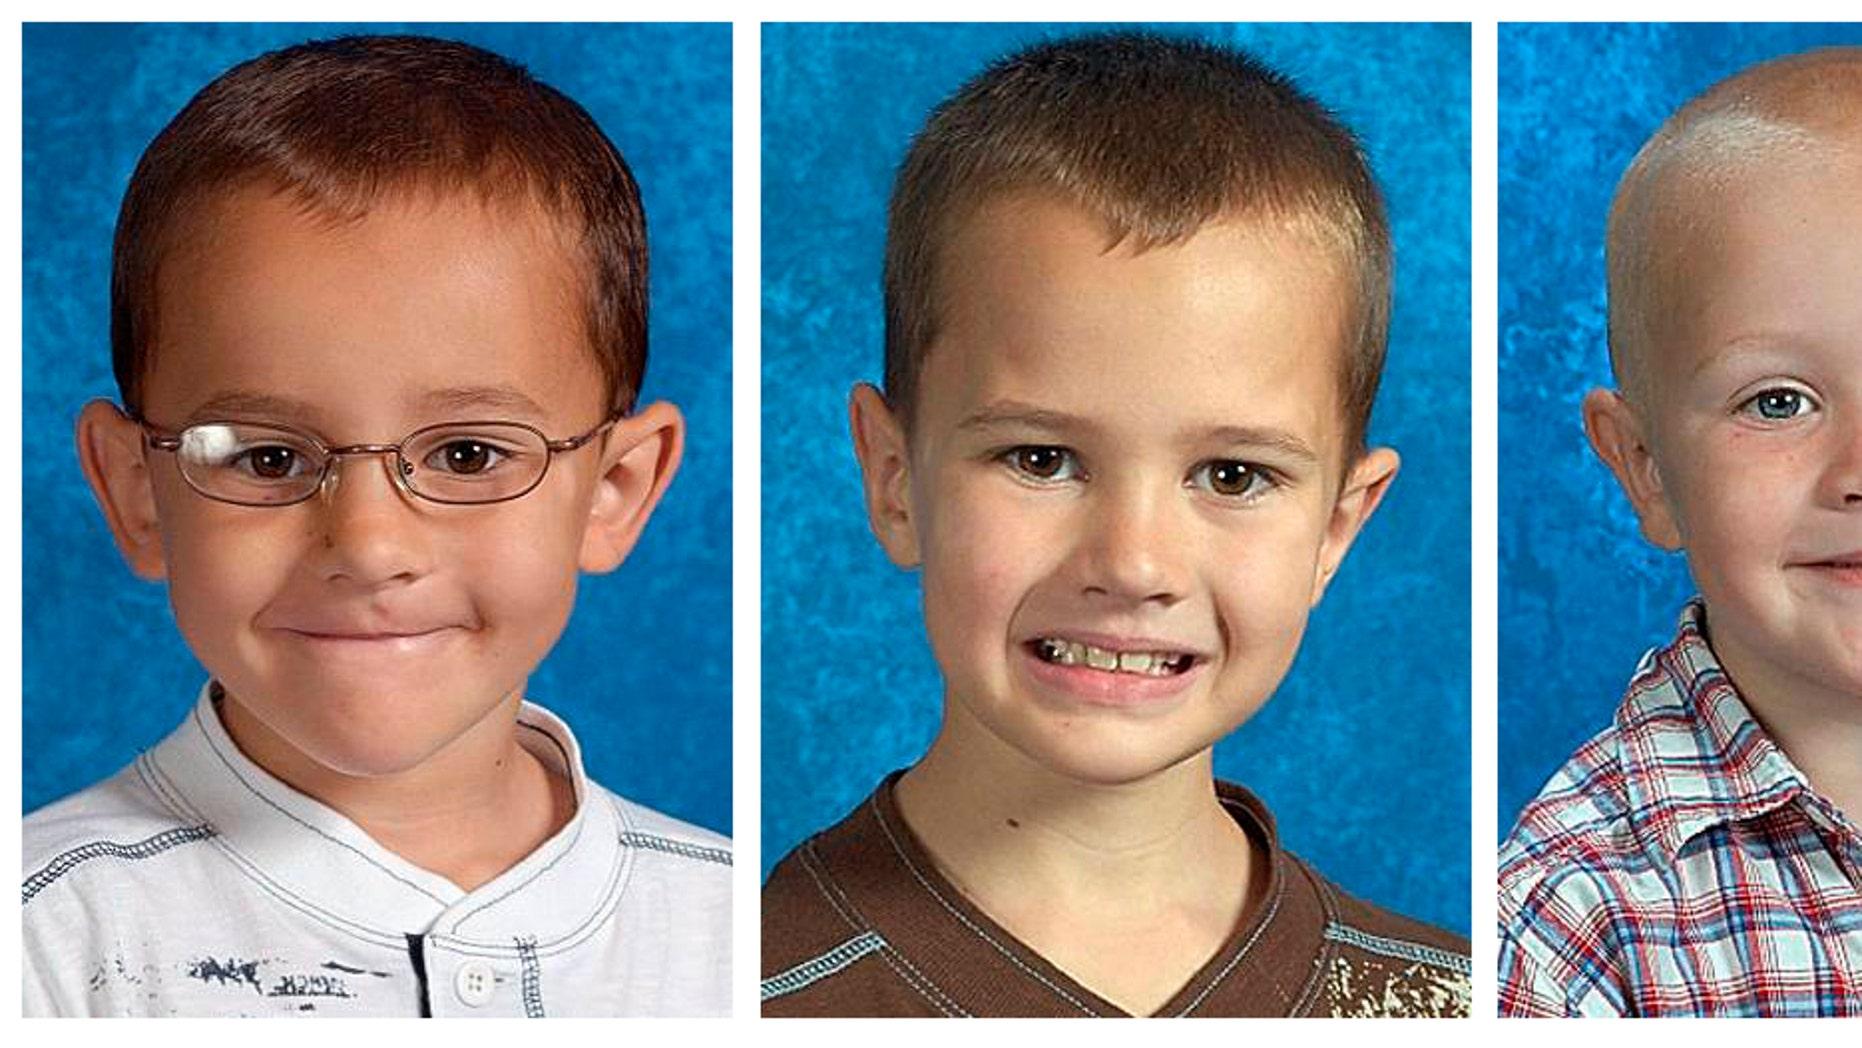 Alexander Skelton, 7 Andrew Skelton, 9, and Tanner Skelton. 5.